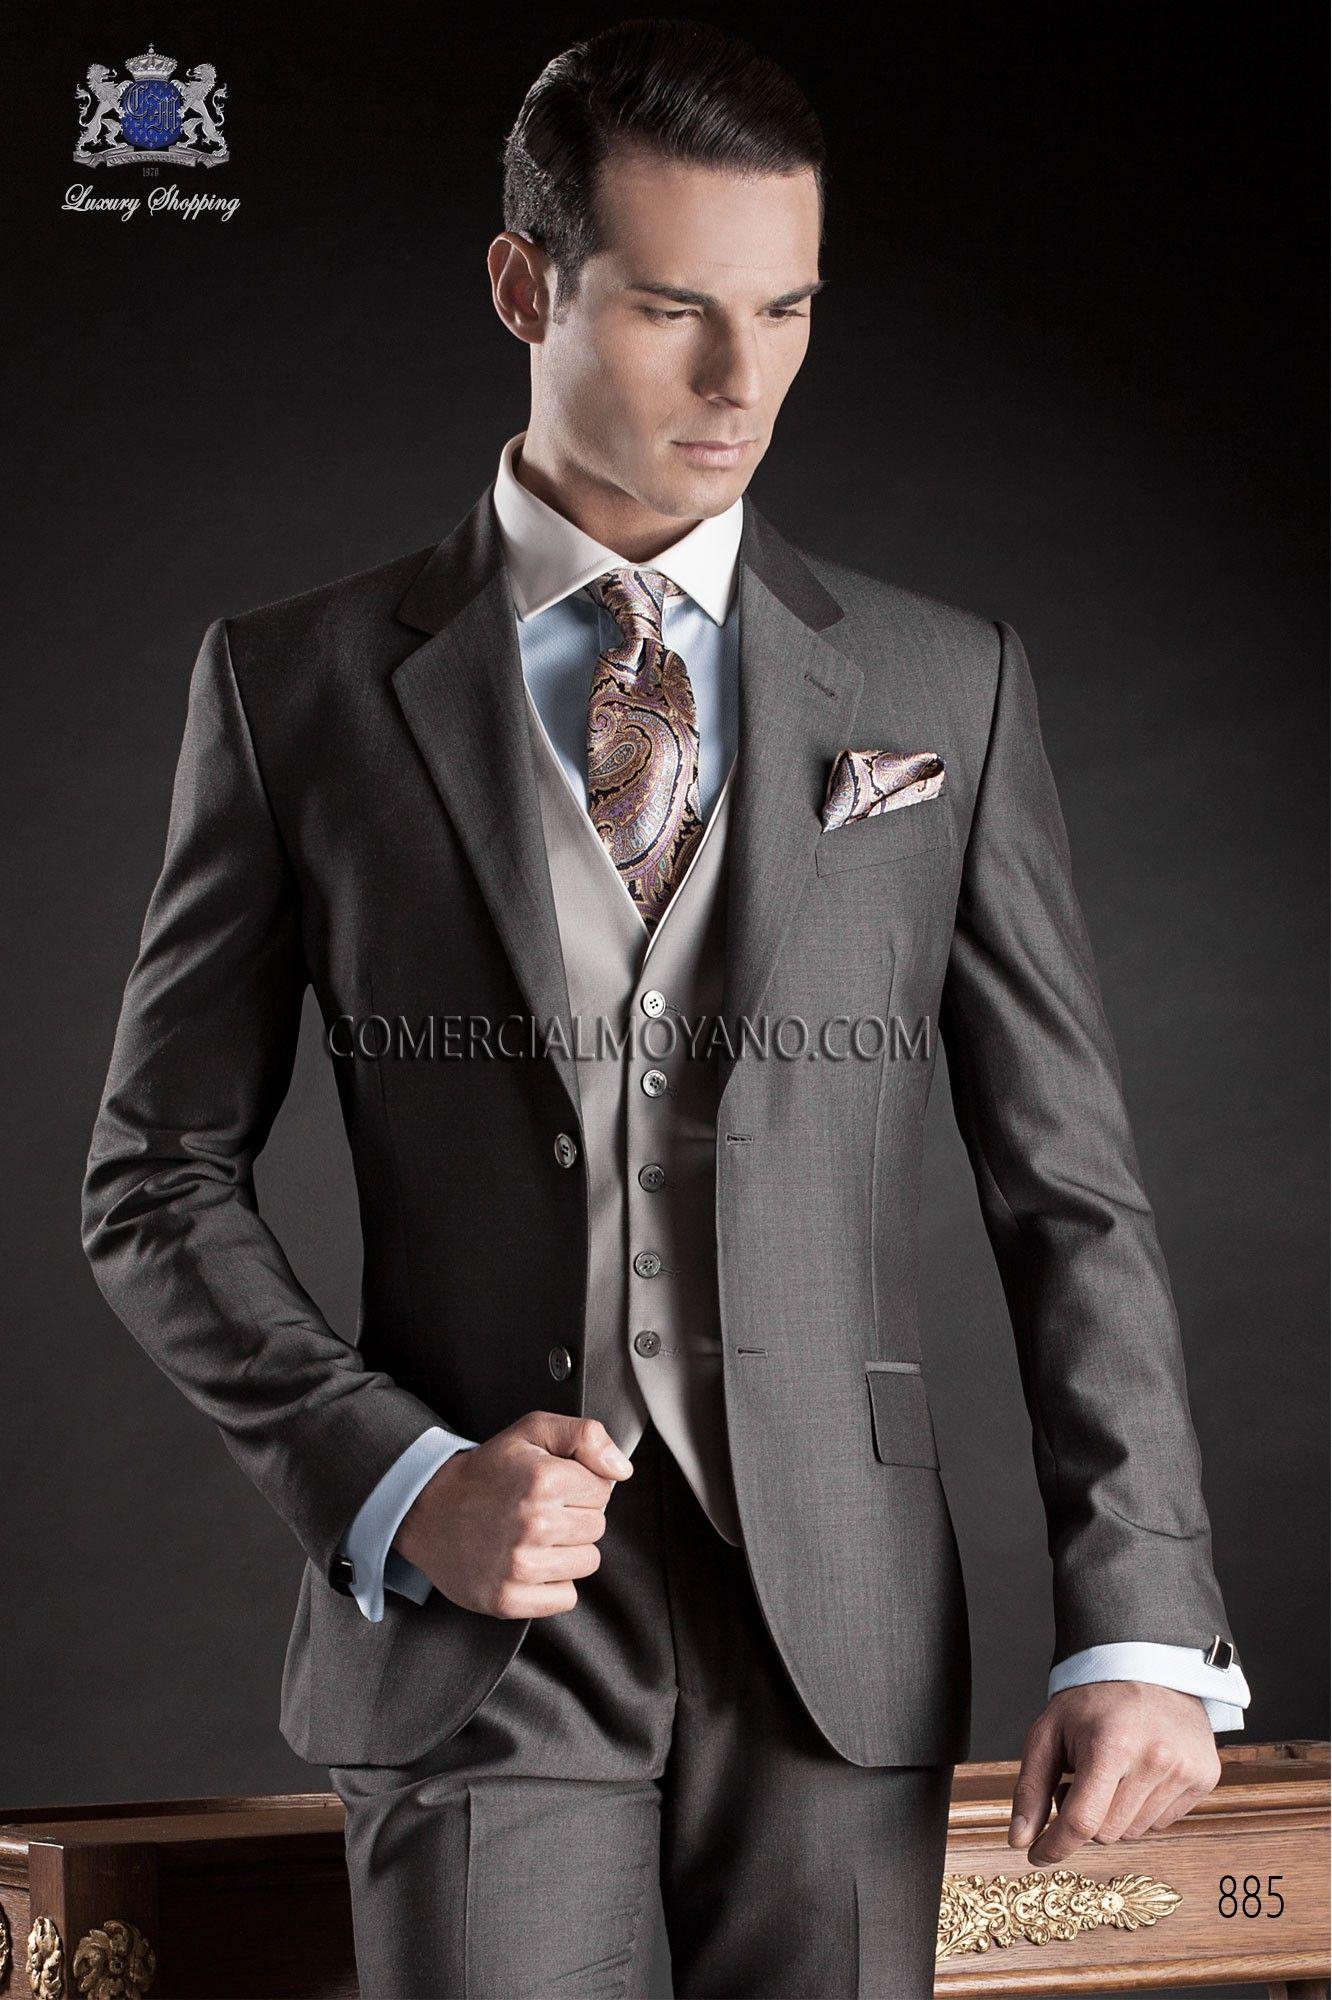 italienne costume de mariage gris costume mari prom suit jackets grey suit wedding et. Black Bedroom Furniture Sets. Home Design Ideas